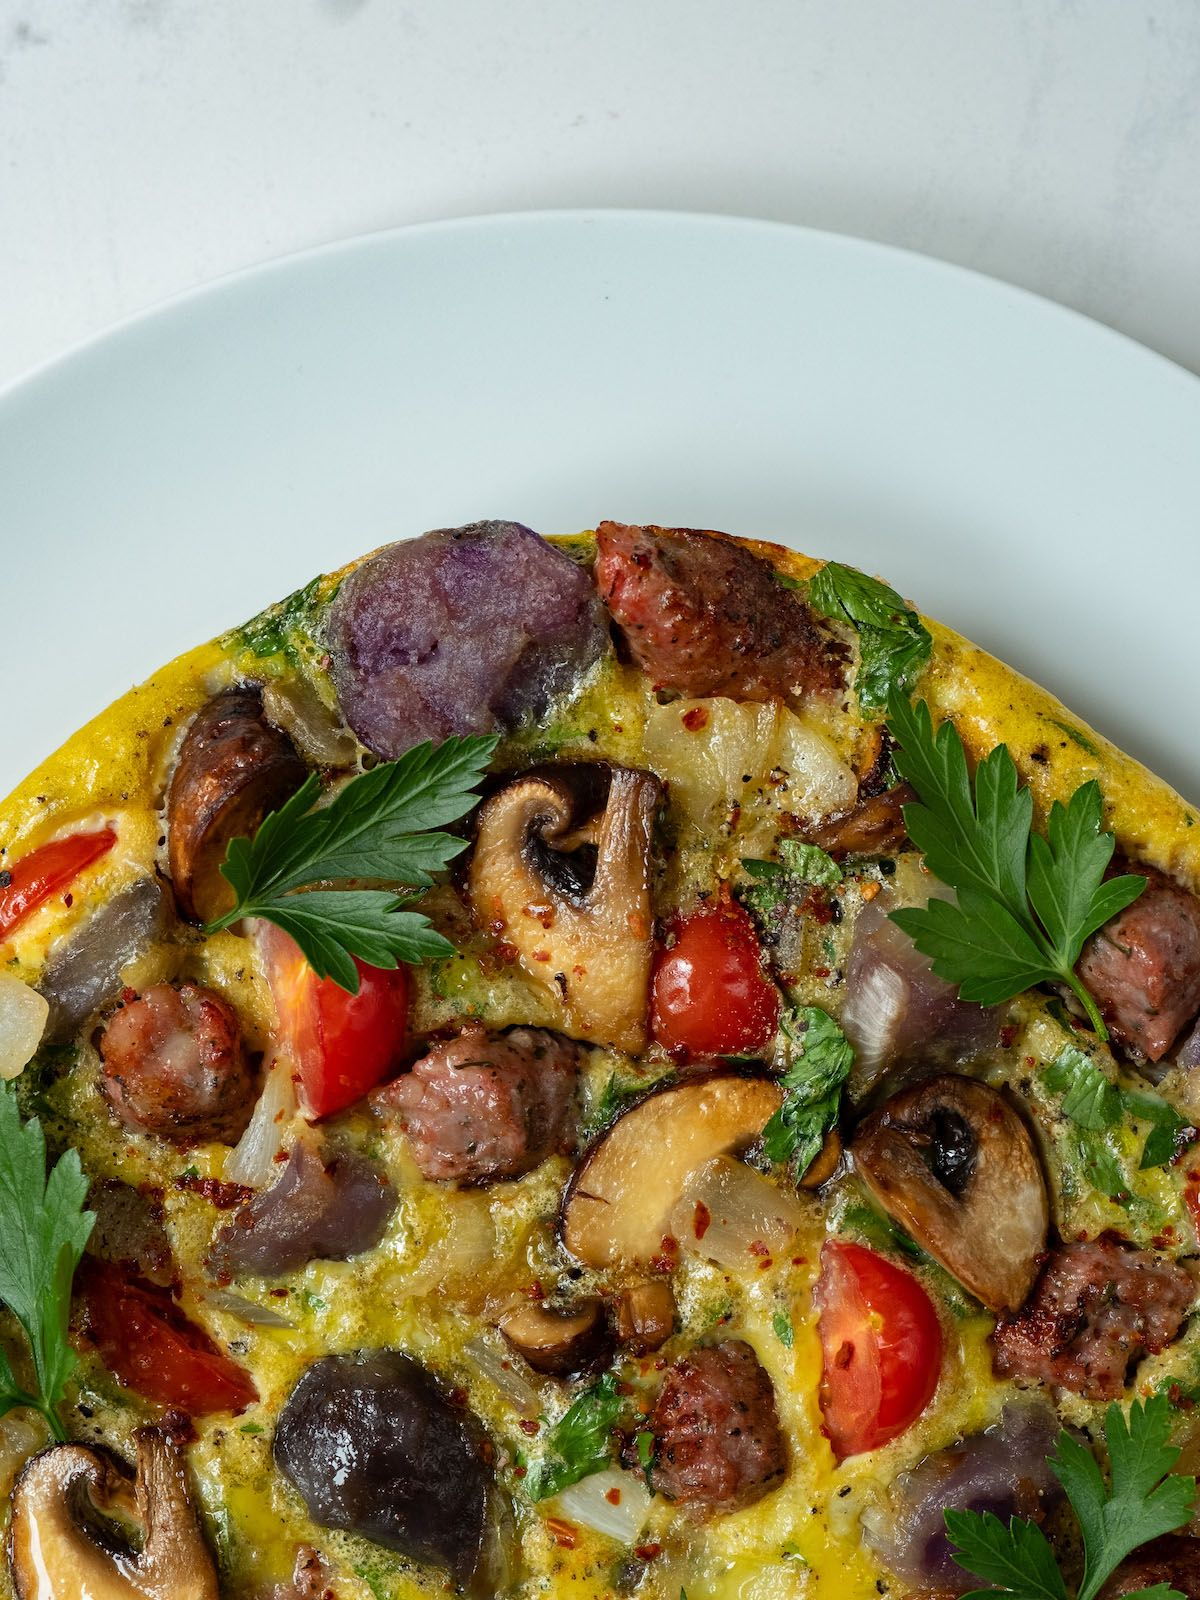 About Fuel, Foodblog, Rezept, Tortilla, Champignons, Bratwurst